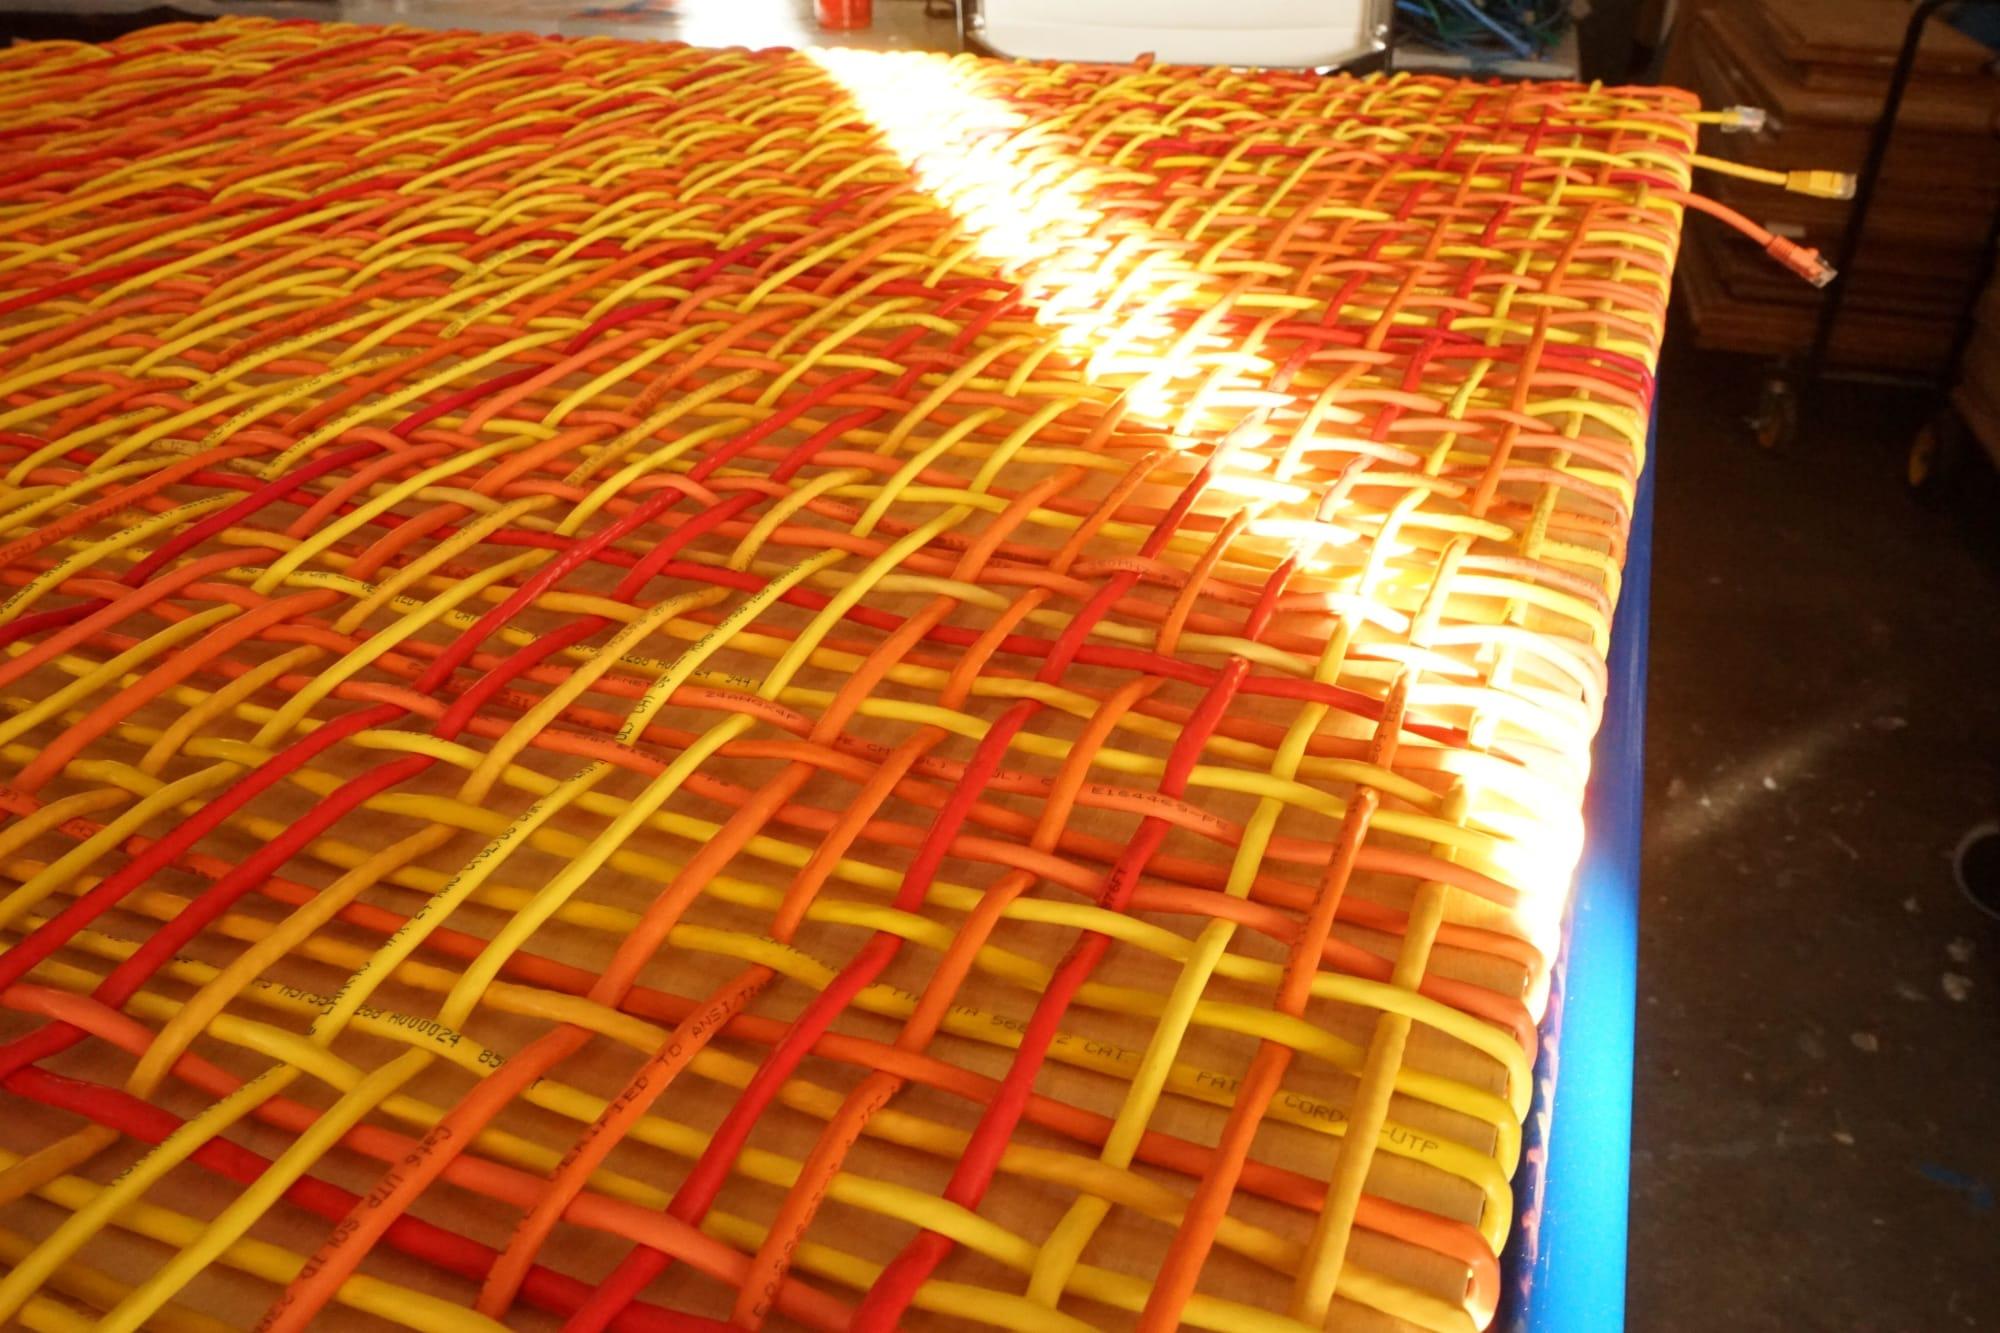 Wall Treatments by ANTLRE - Hannah Sitzer seen at Argo AI, Palo Alto - Ethernet Weavings